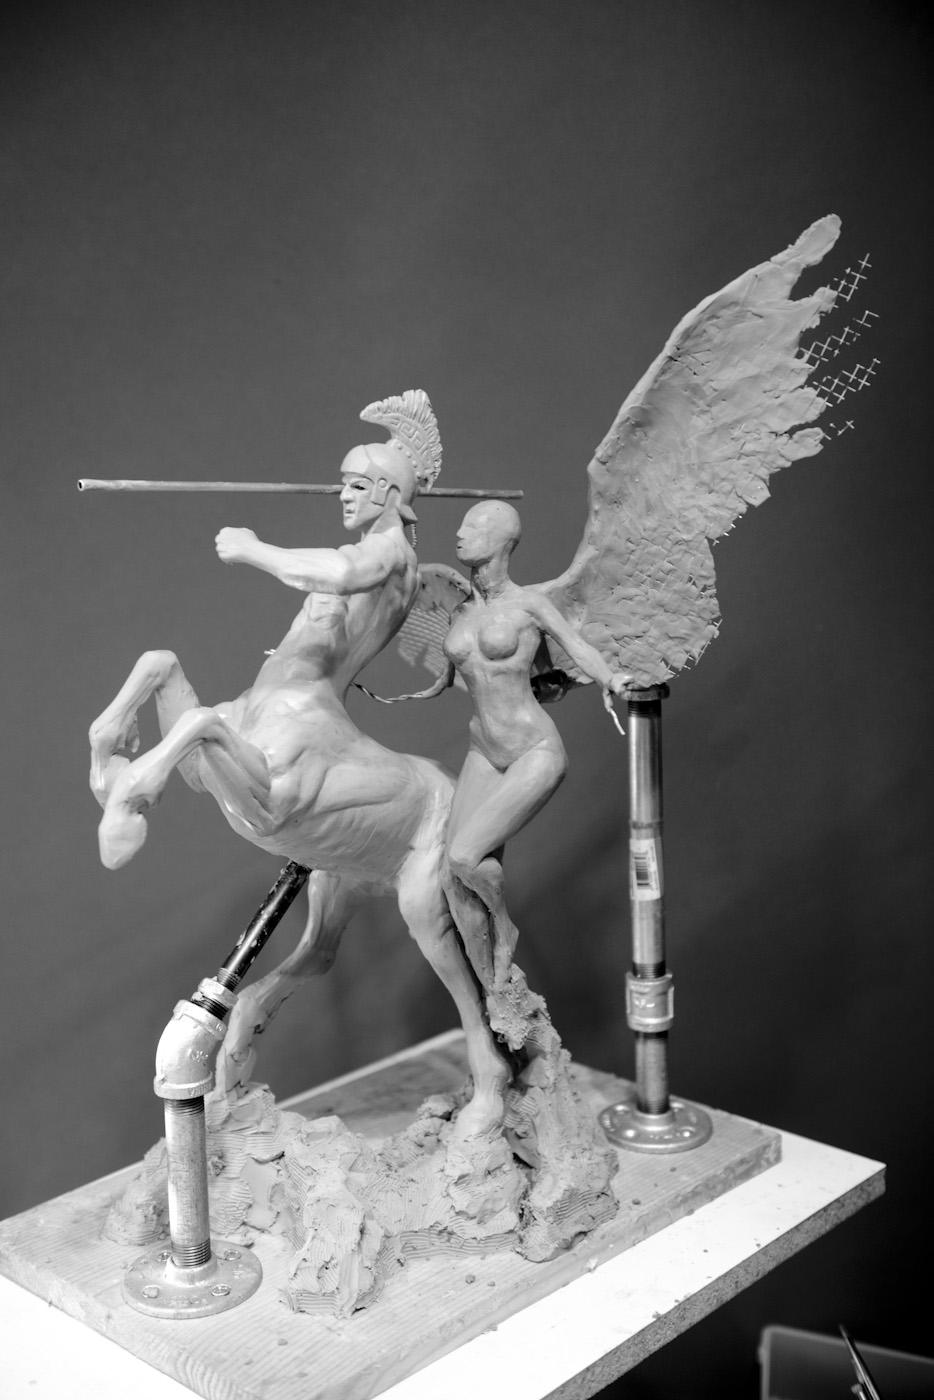 Victory-Centaur-140329-016-048.jpg